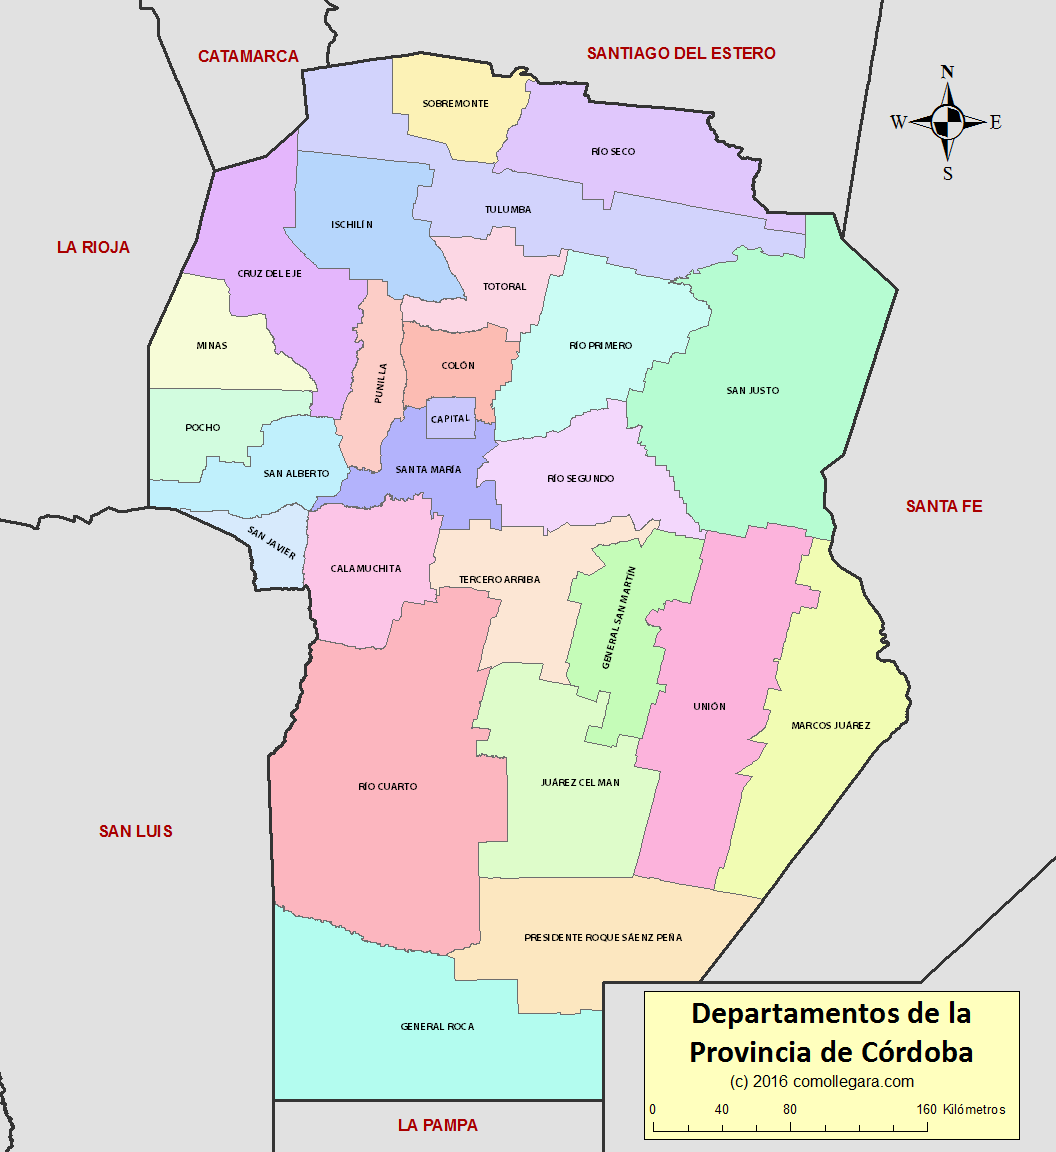 Provincia de Córdoba Argentina Departamentos División Política Mapa